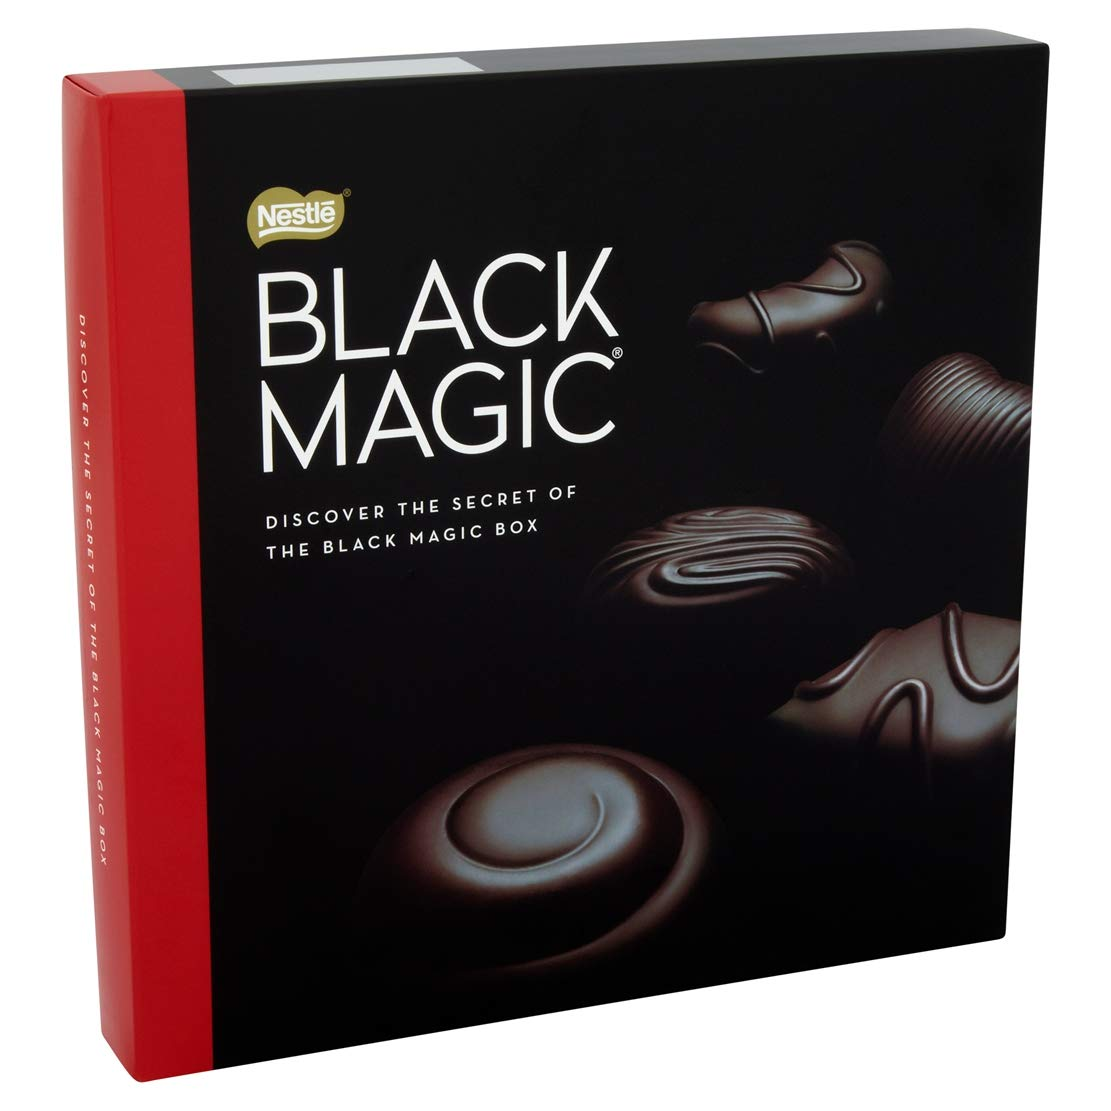 Black Magic Chocolate Small Box 174g Pack Of 8